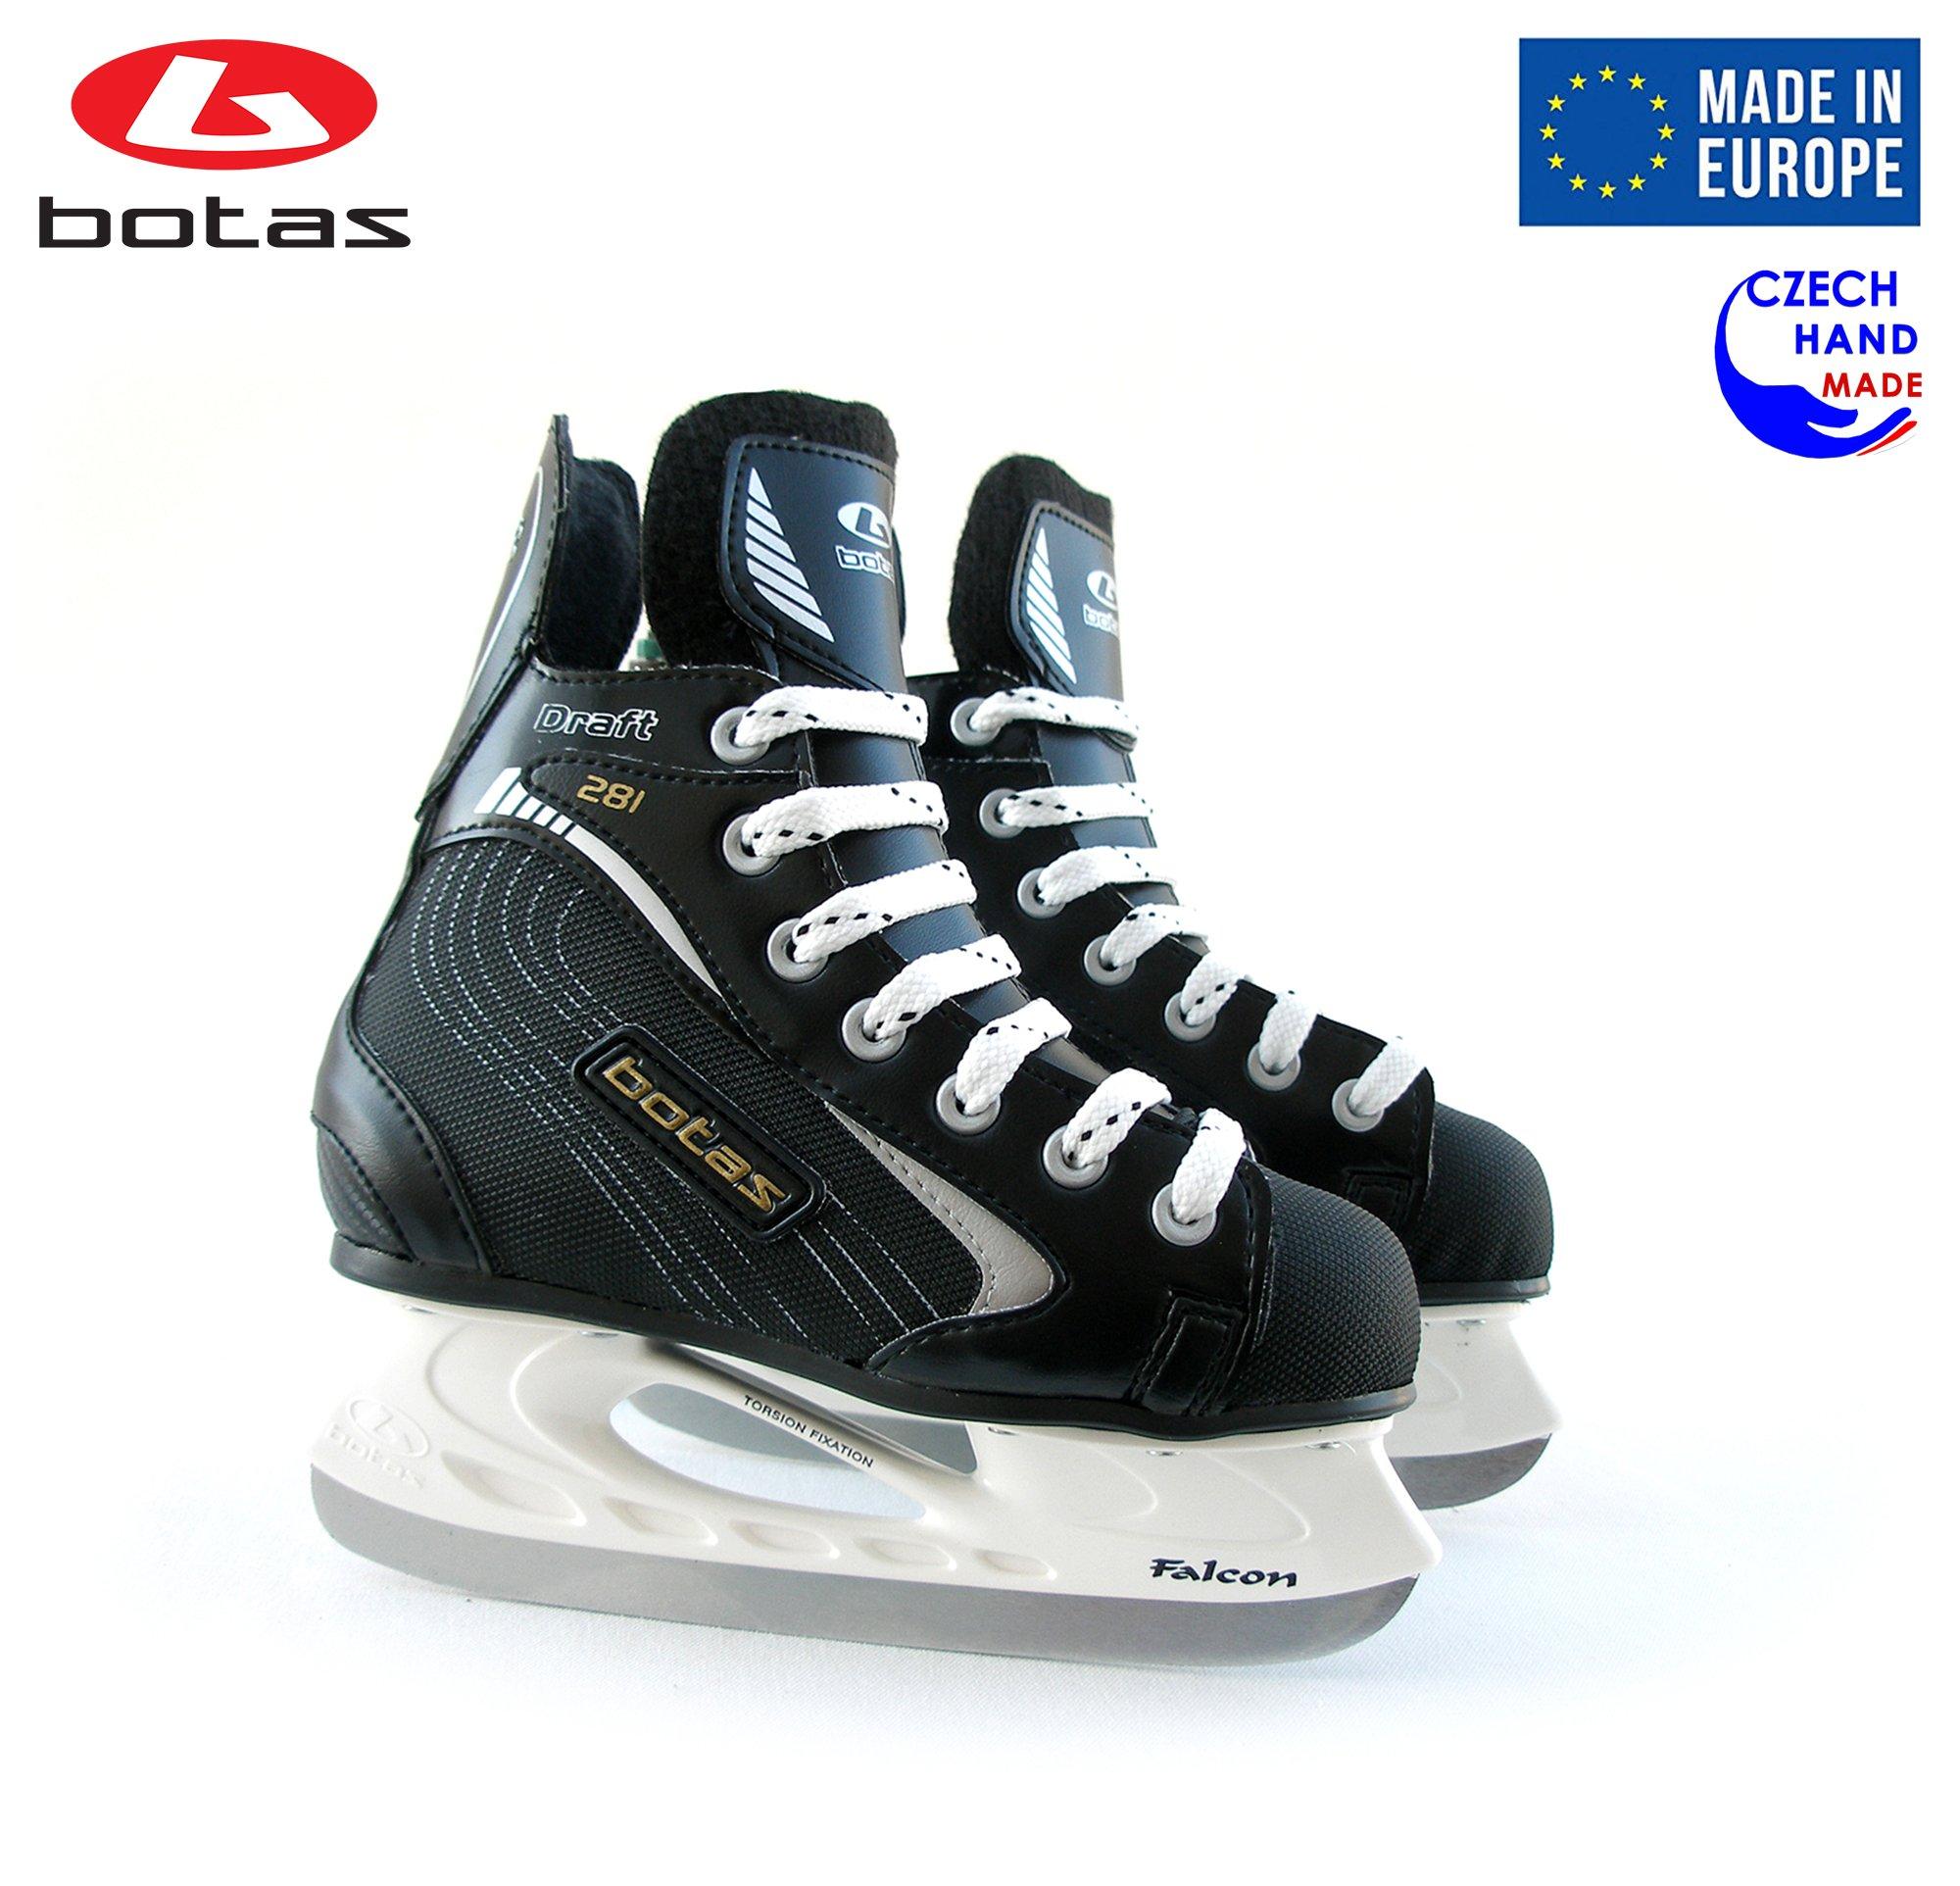 Botas - Draft 281 - Kids Ice Hockey Skates | Made in Europe (Czech Republic) | Color: Black, Size Child 1